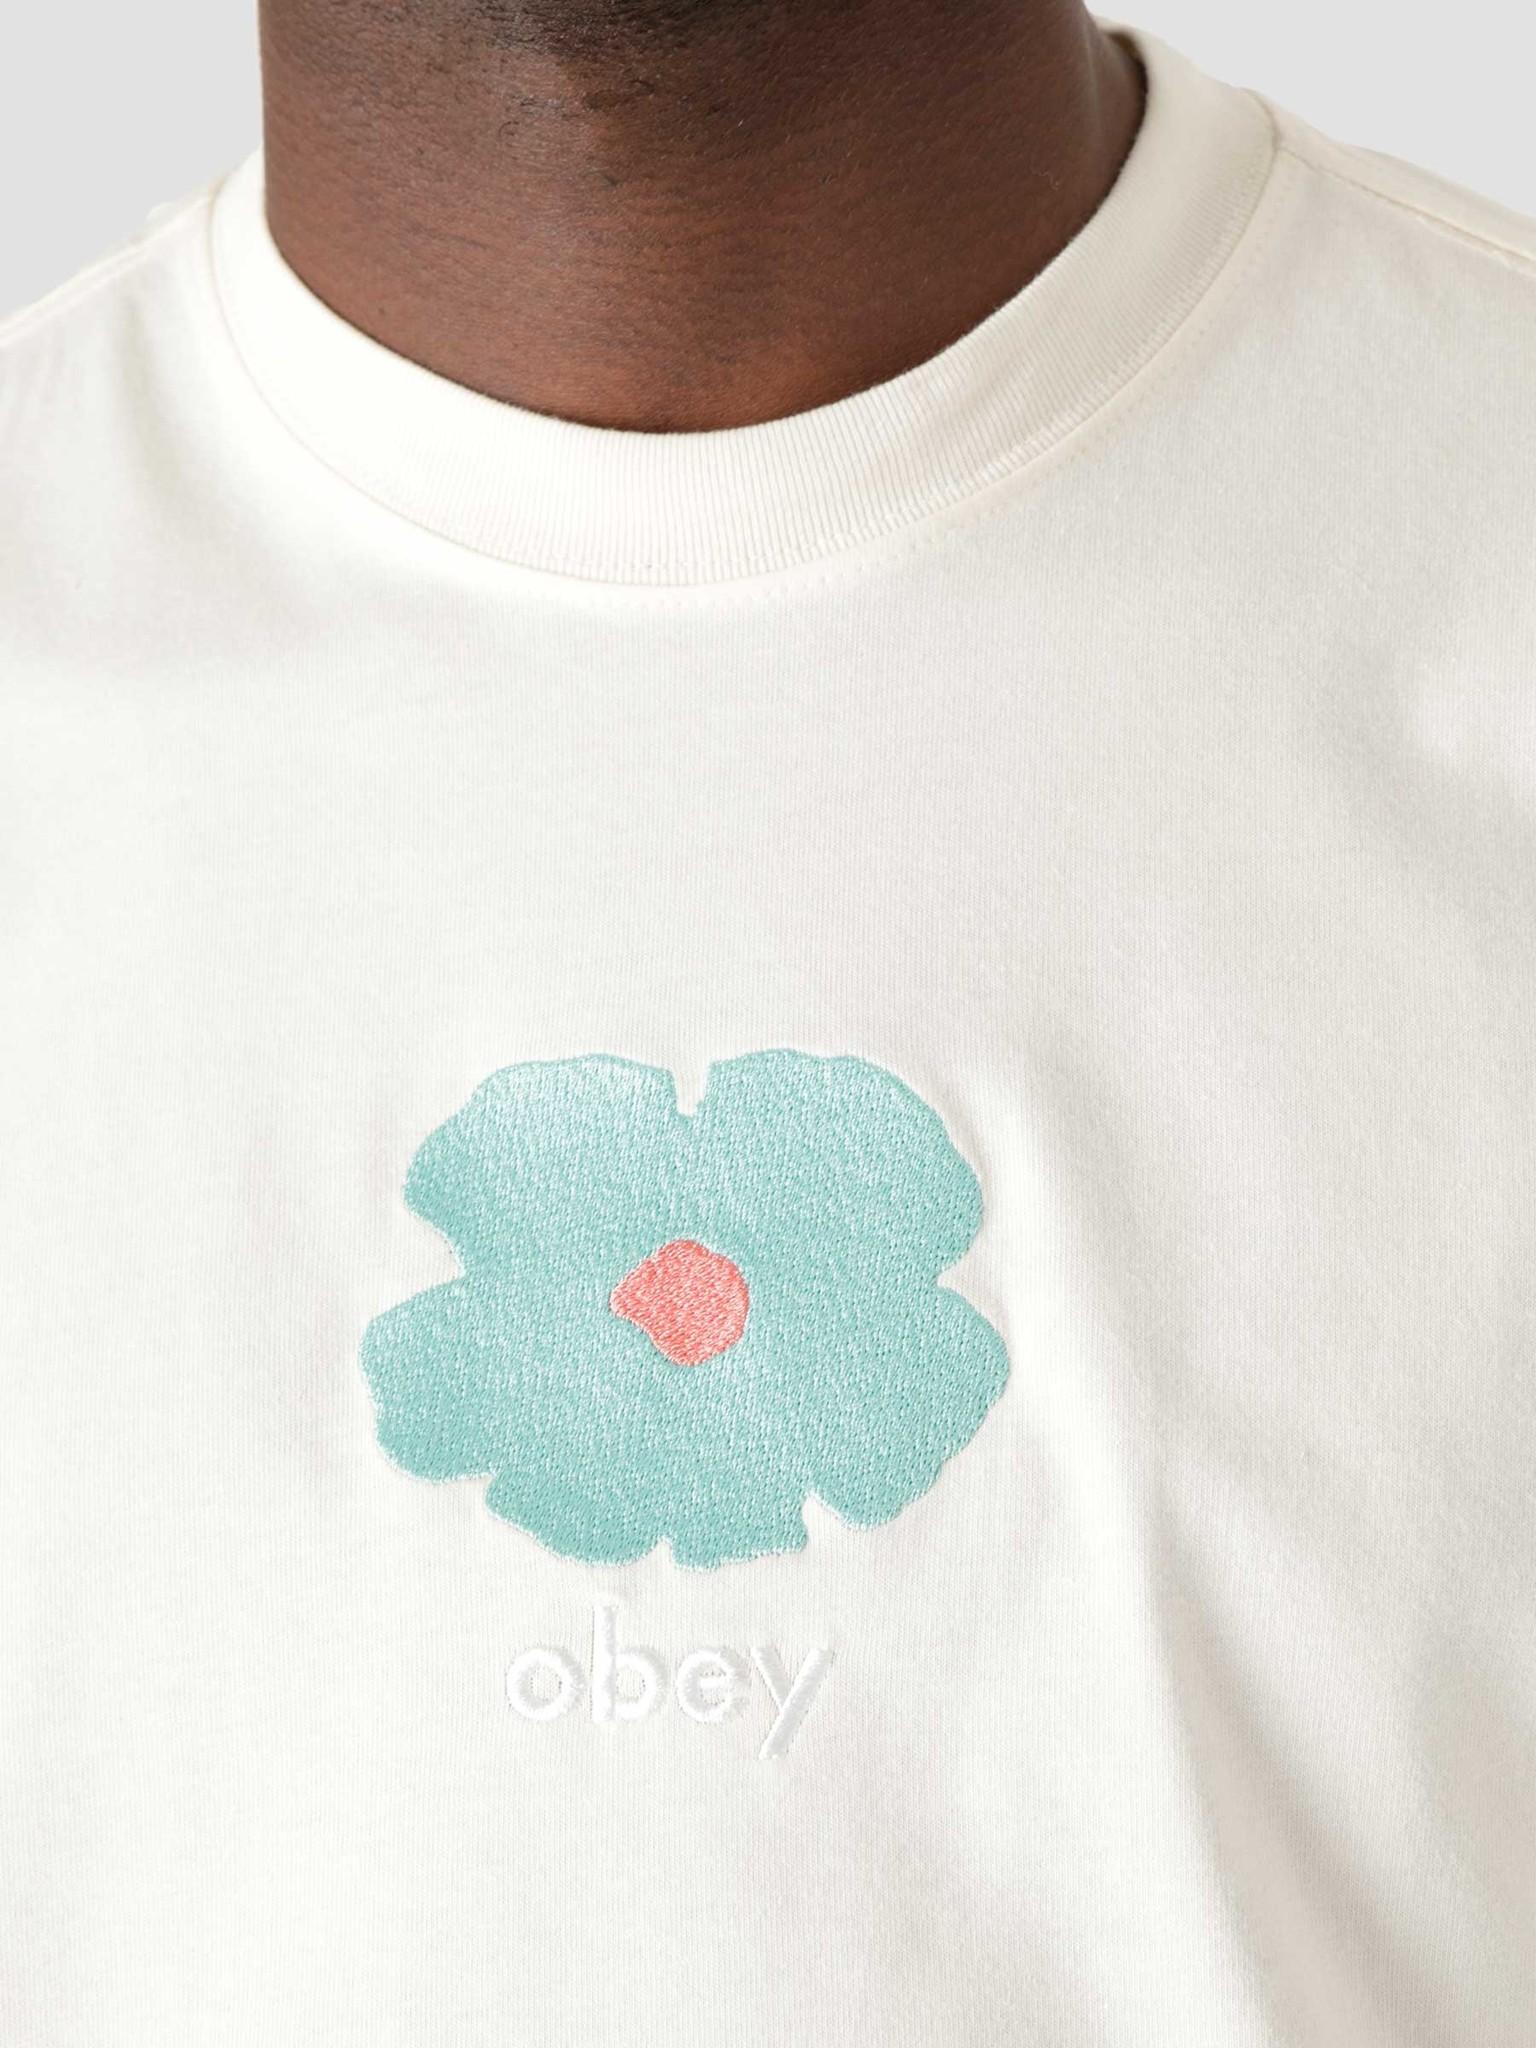 Obey Obey Elijah Tee Shortsleeve Sago 131080306